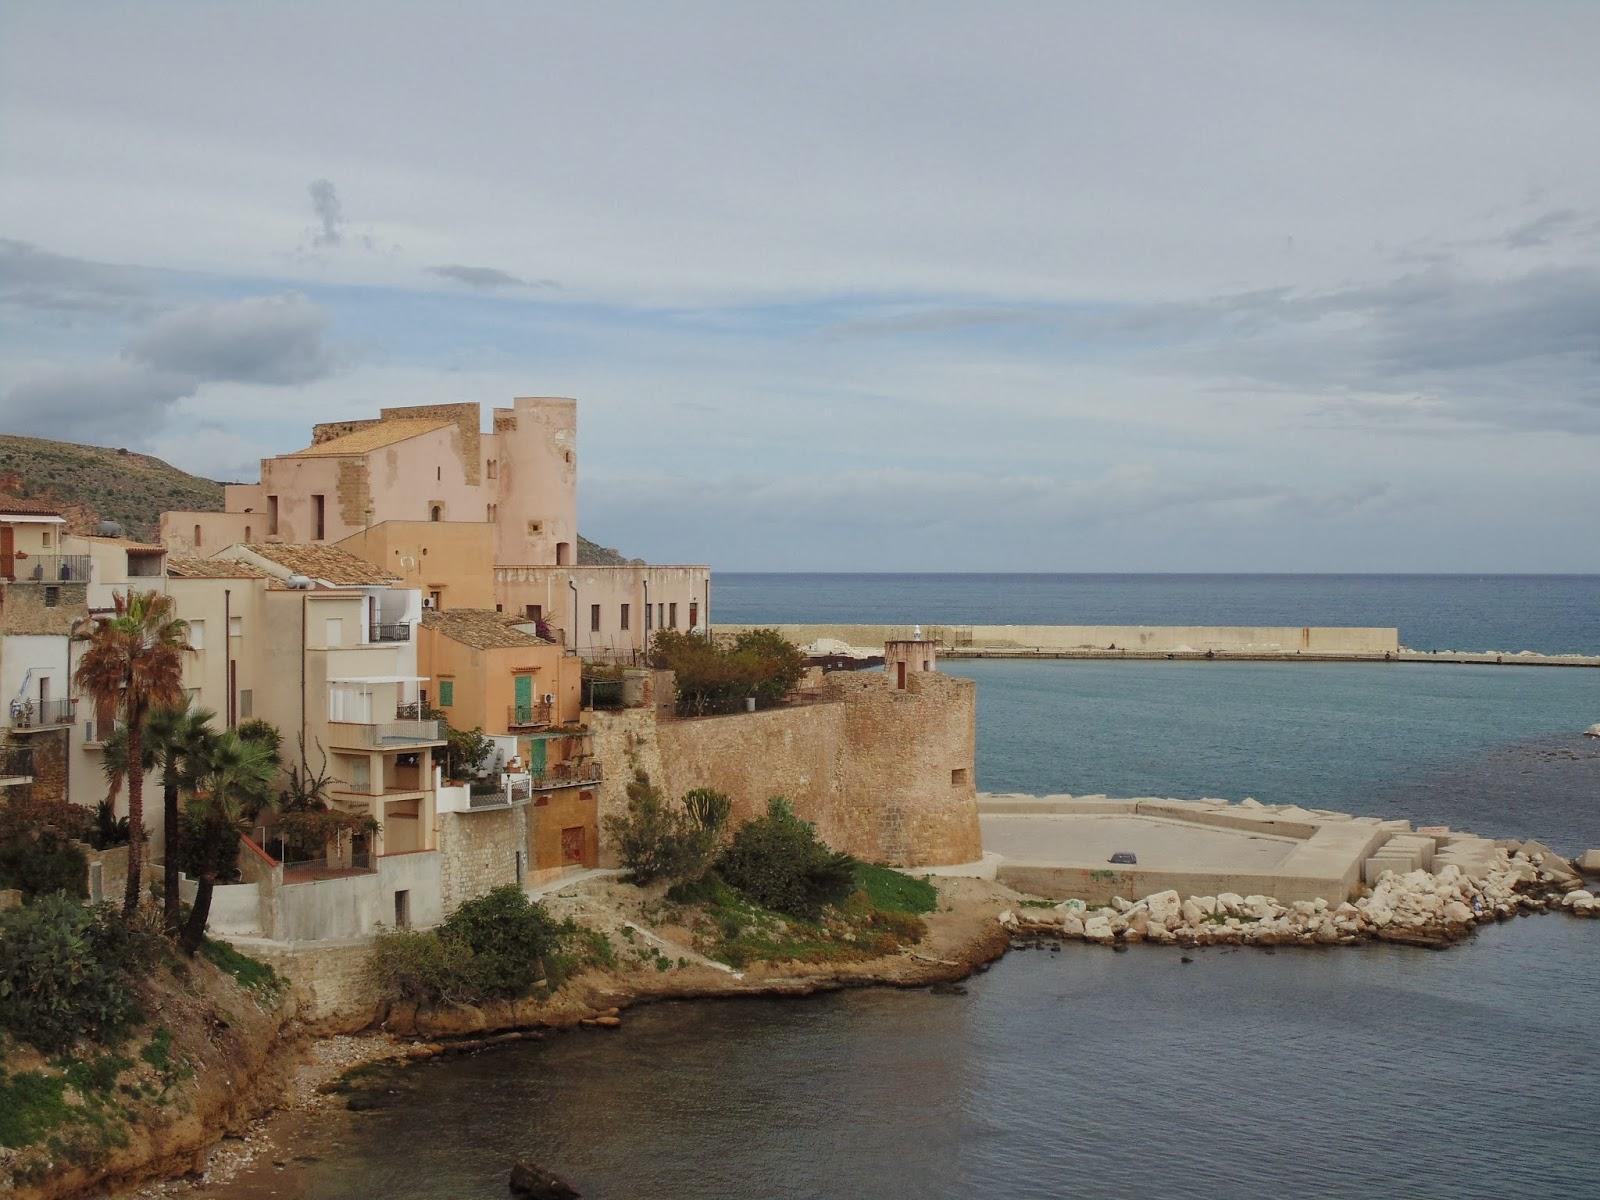 Castellammare del golfo sicily italy stock photo image 48782909 - Castellammare Del Golfo Italy City Pictures Trip To Castellammare Del Golfo Italy Sicily